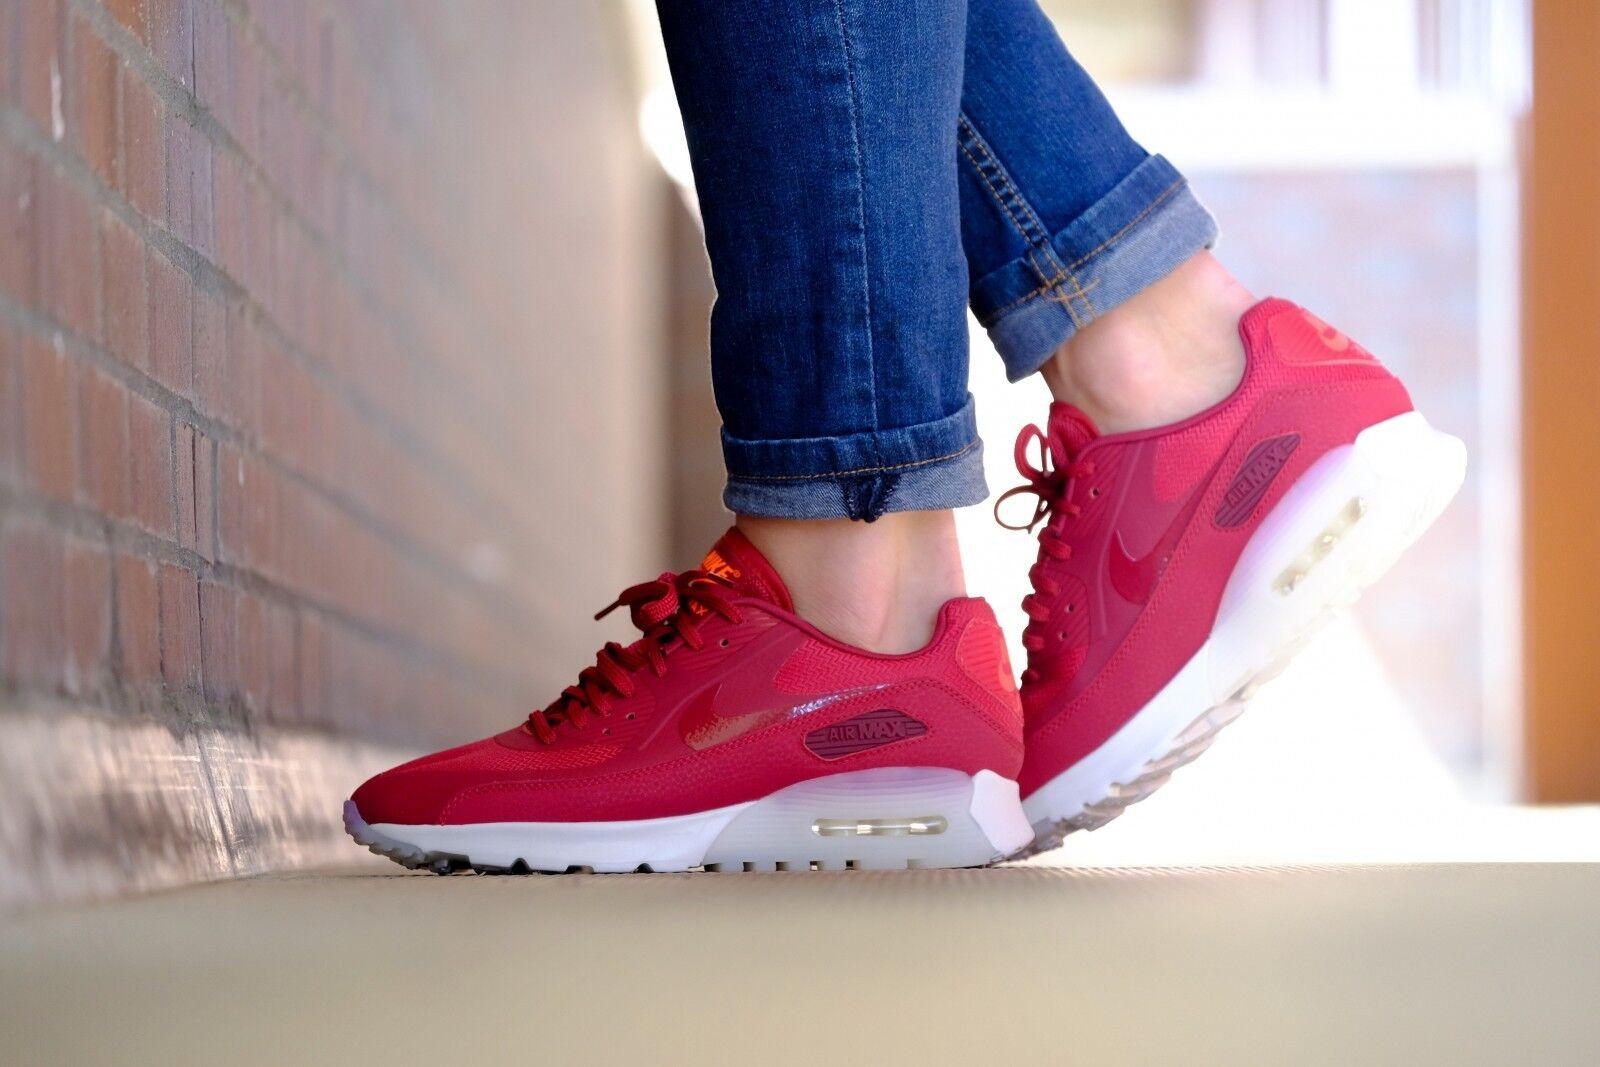 Nike air max 90 ultra femminili sz 845110-600 845110-600 845110-600 nobile rosso / bianco al vertice 747774